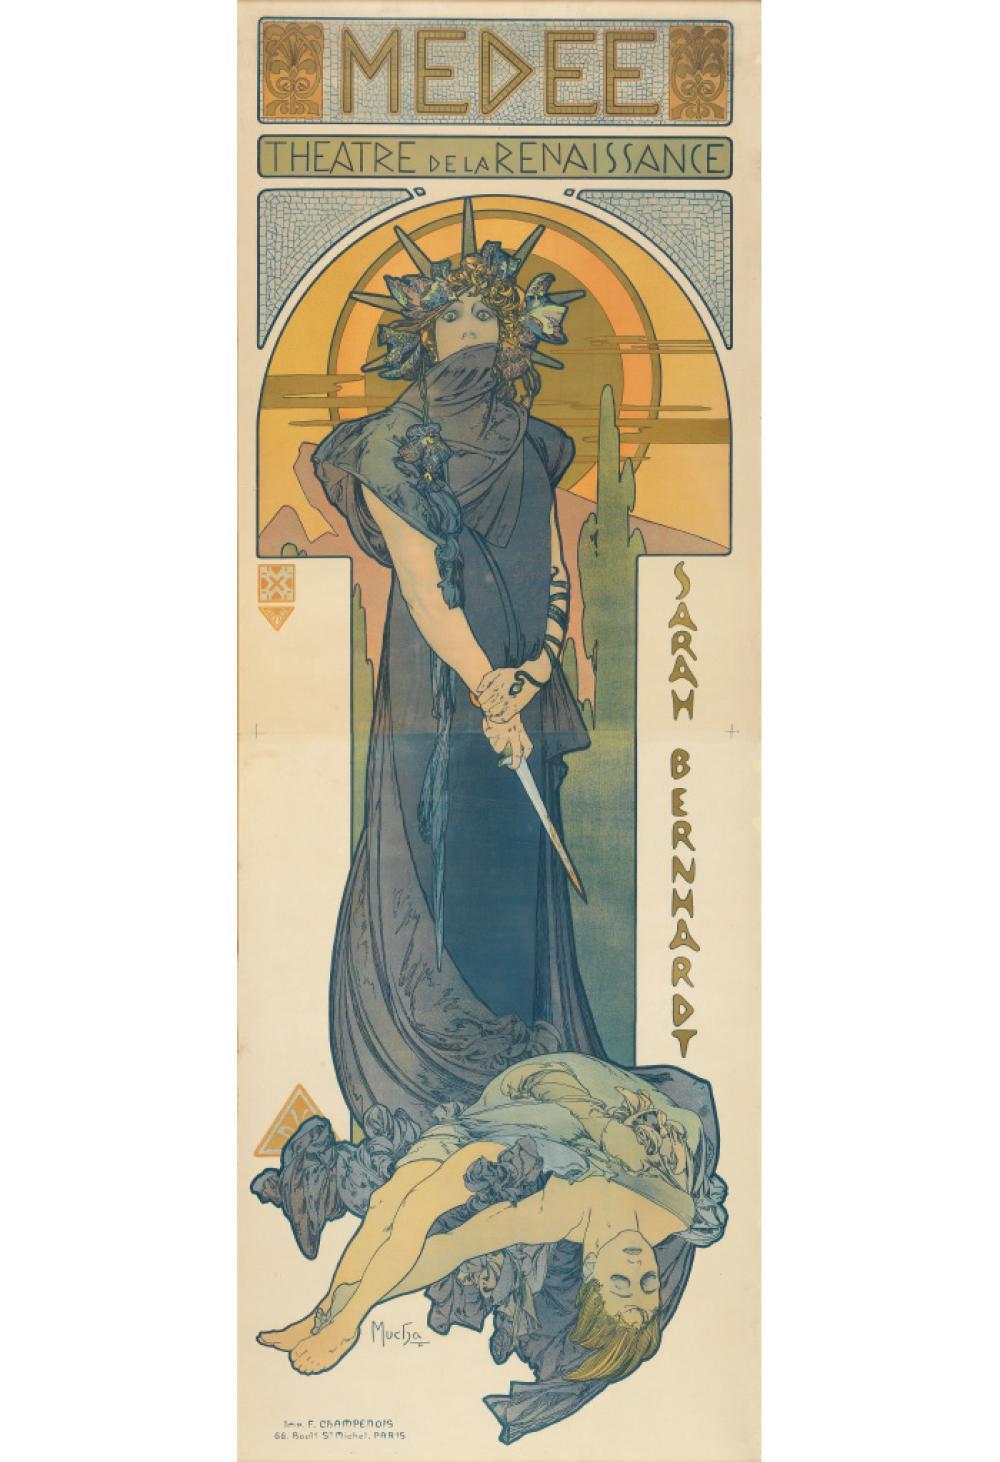 ALPHONSE MUCHA (1860-1939). MEDEE / SARAH BERNHARDT. 1898. 81x29 inches, 207x75 cm. F. Champenois, Paris.